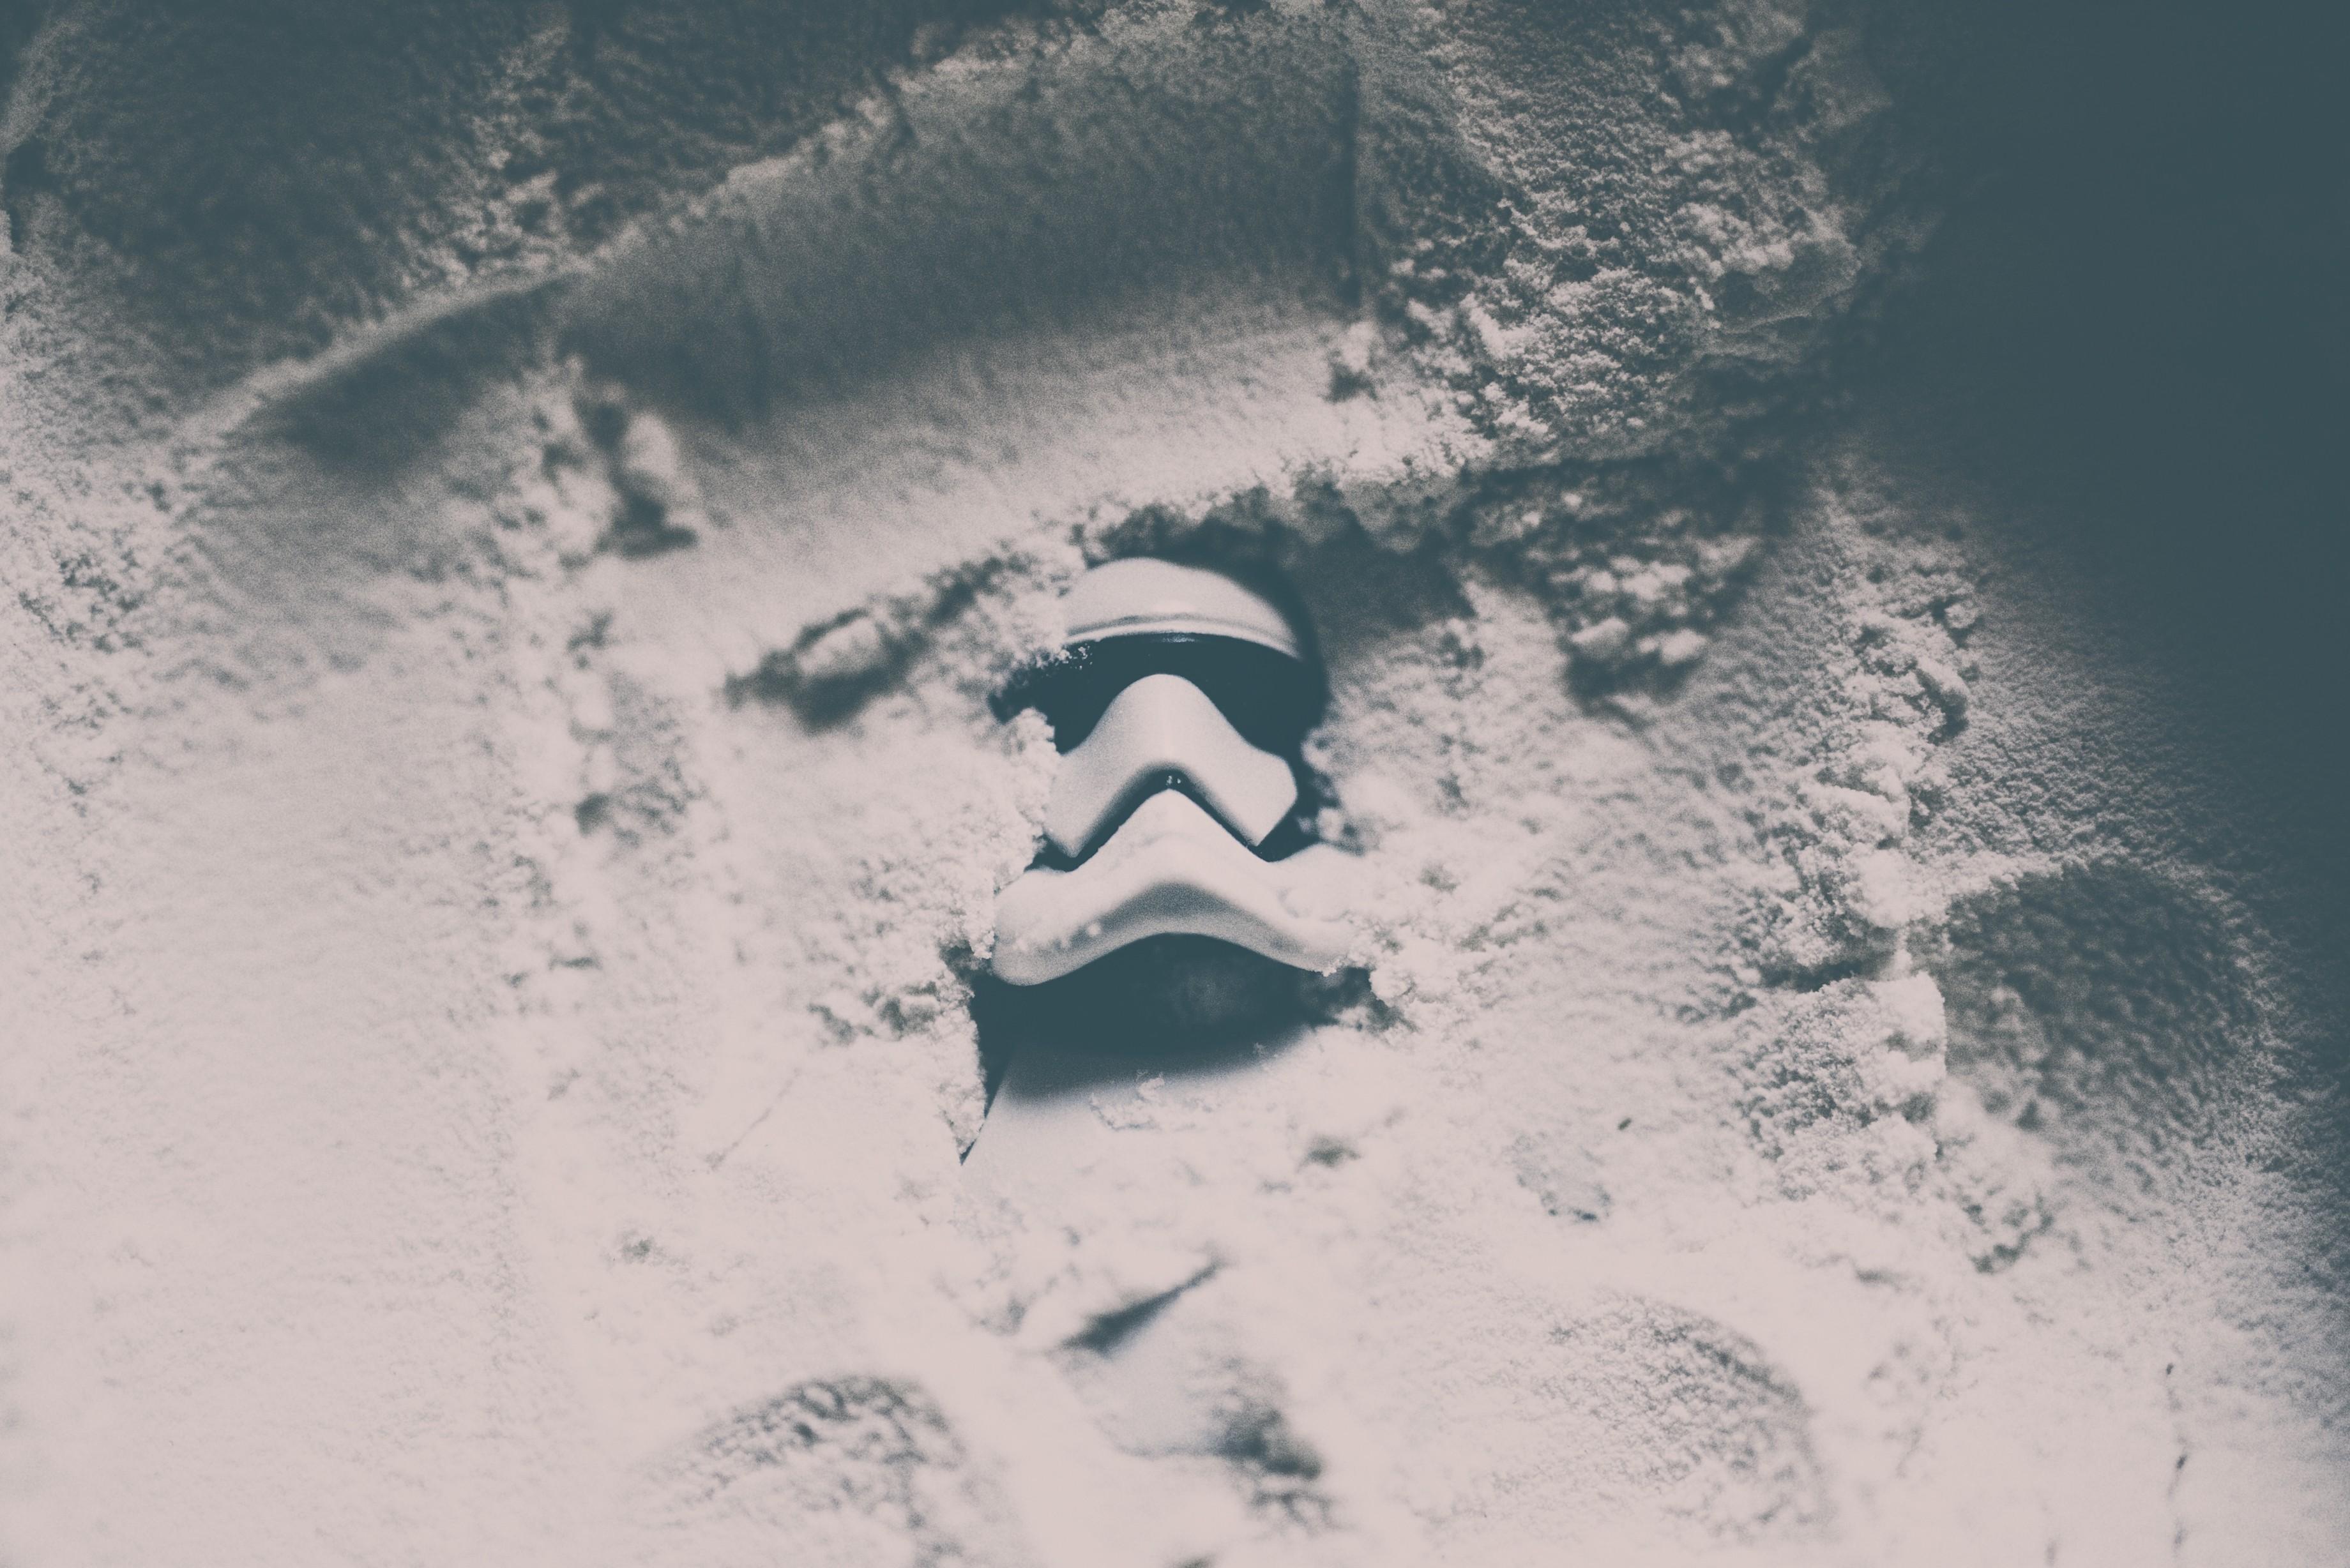 Wallpaper Drawing White Star Wars Sand Minimalism Snow Winter Blue Helmet Simple Trooper Jedi Stormtrooper Freezing Wave Sketch Atmosphere Of Earth 3680x2456 Kriponja 7782 Hd Wallpapers Wallhere